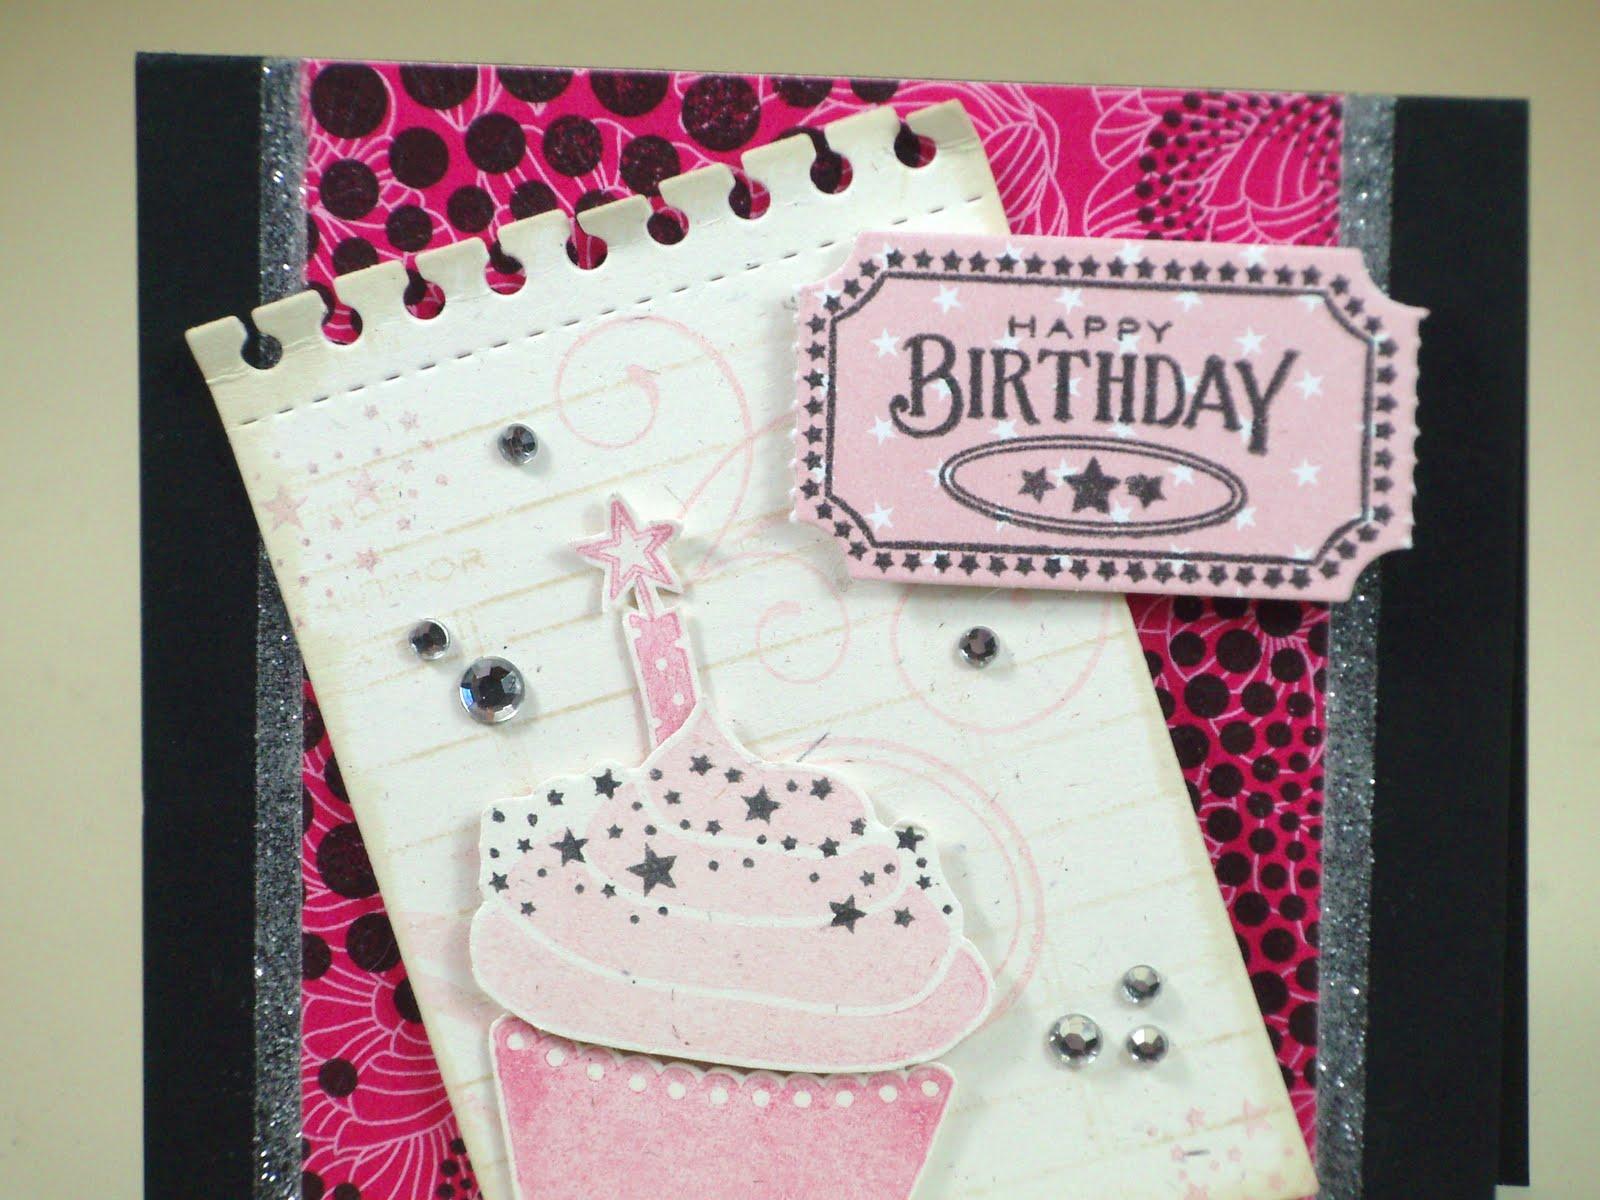 http://3.bp.blogspot.com/_fDtTpszUVqs/THlkdtXFcAI/AAAAAAAABJA/jFGOuwt3eeU/s1600/Birthday+Cupcake+003.JPG